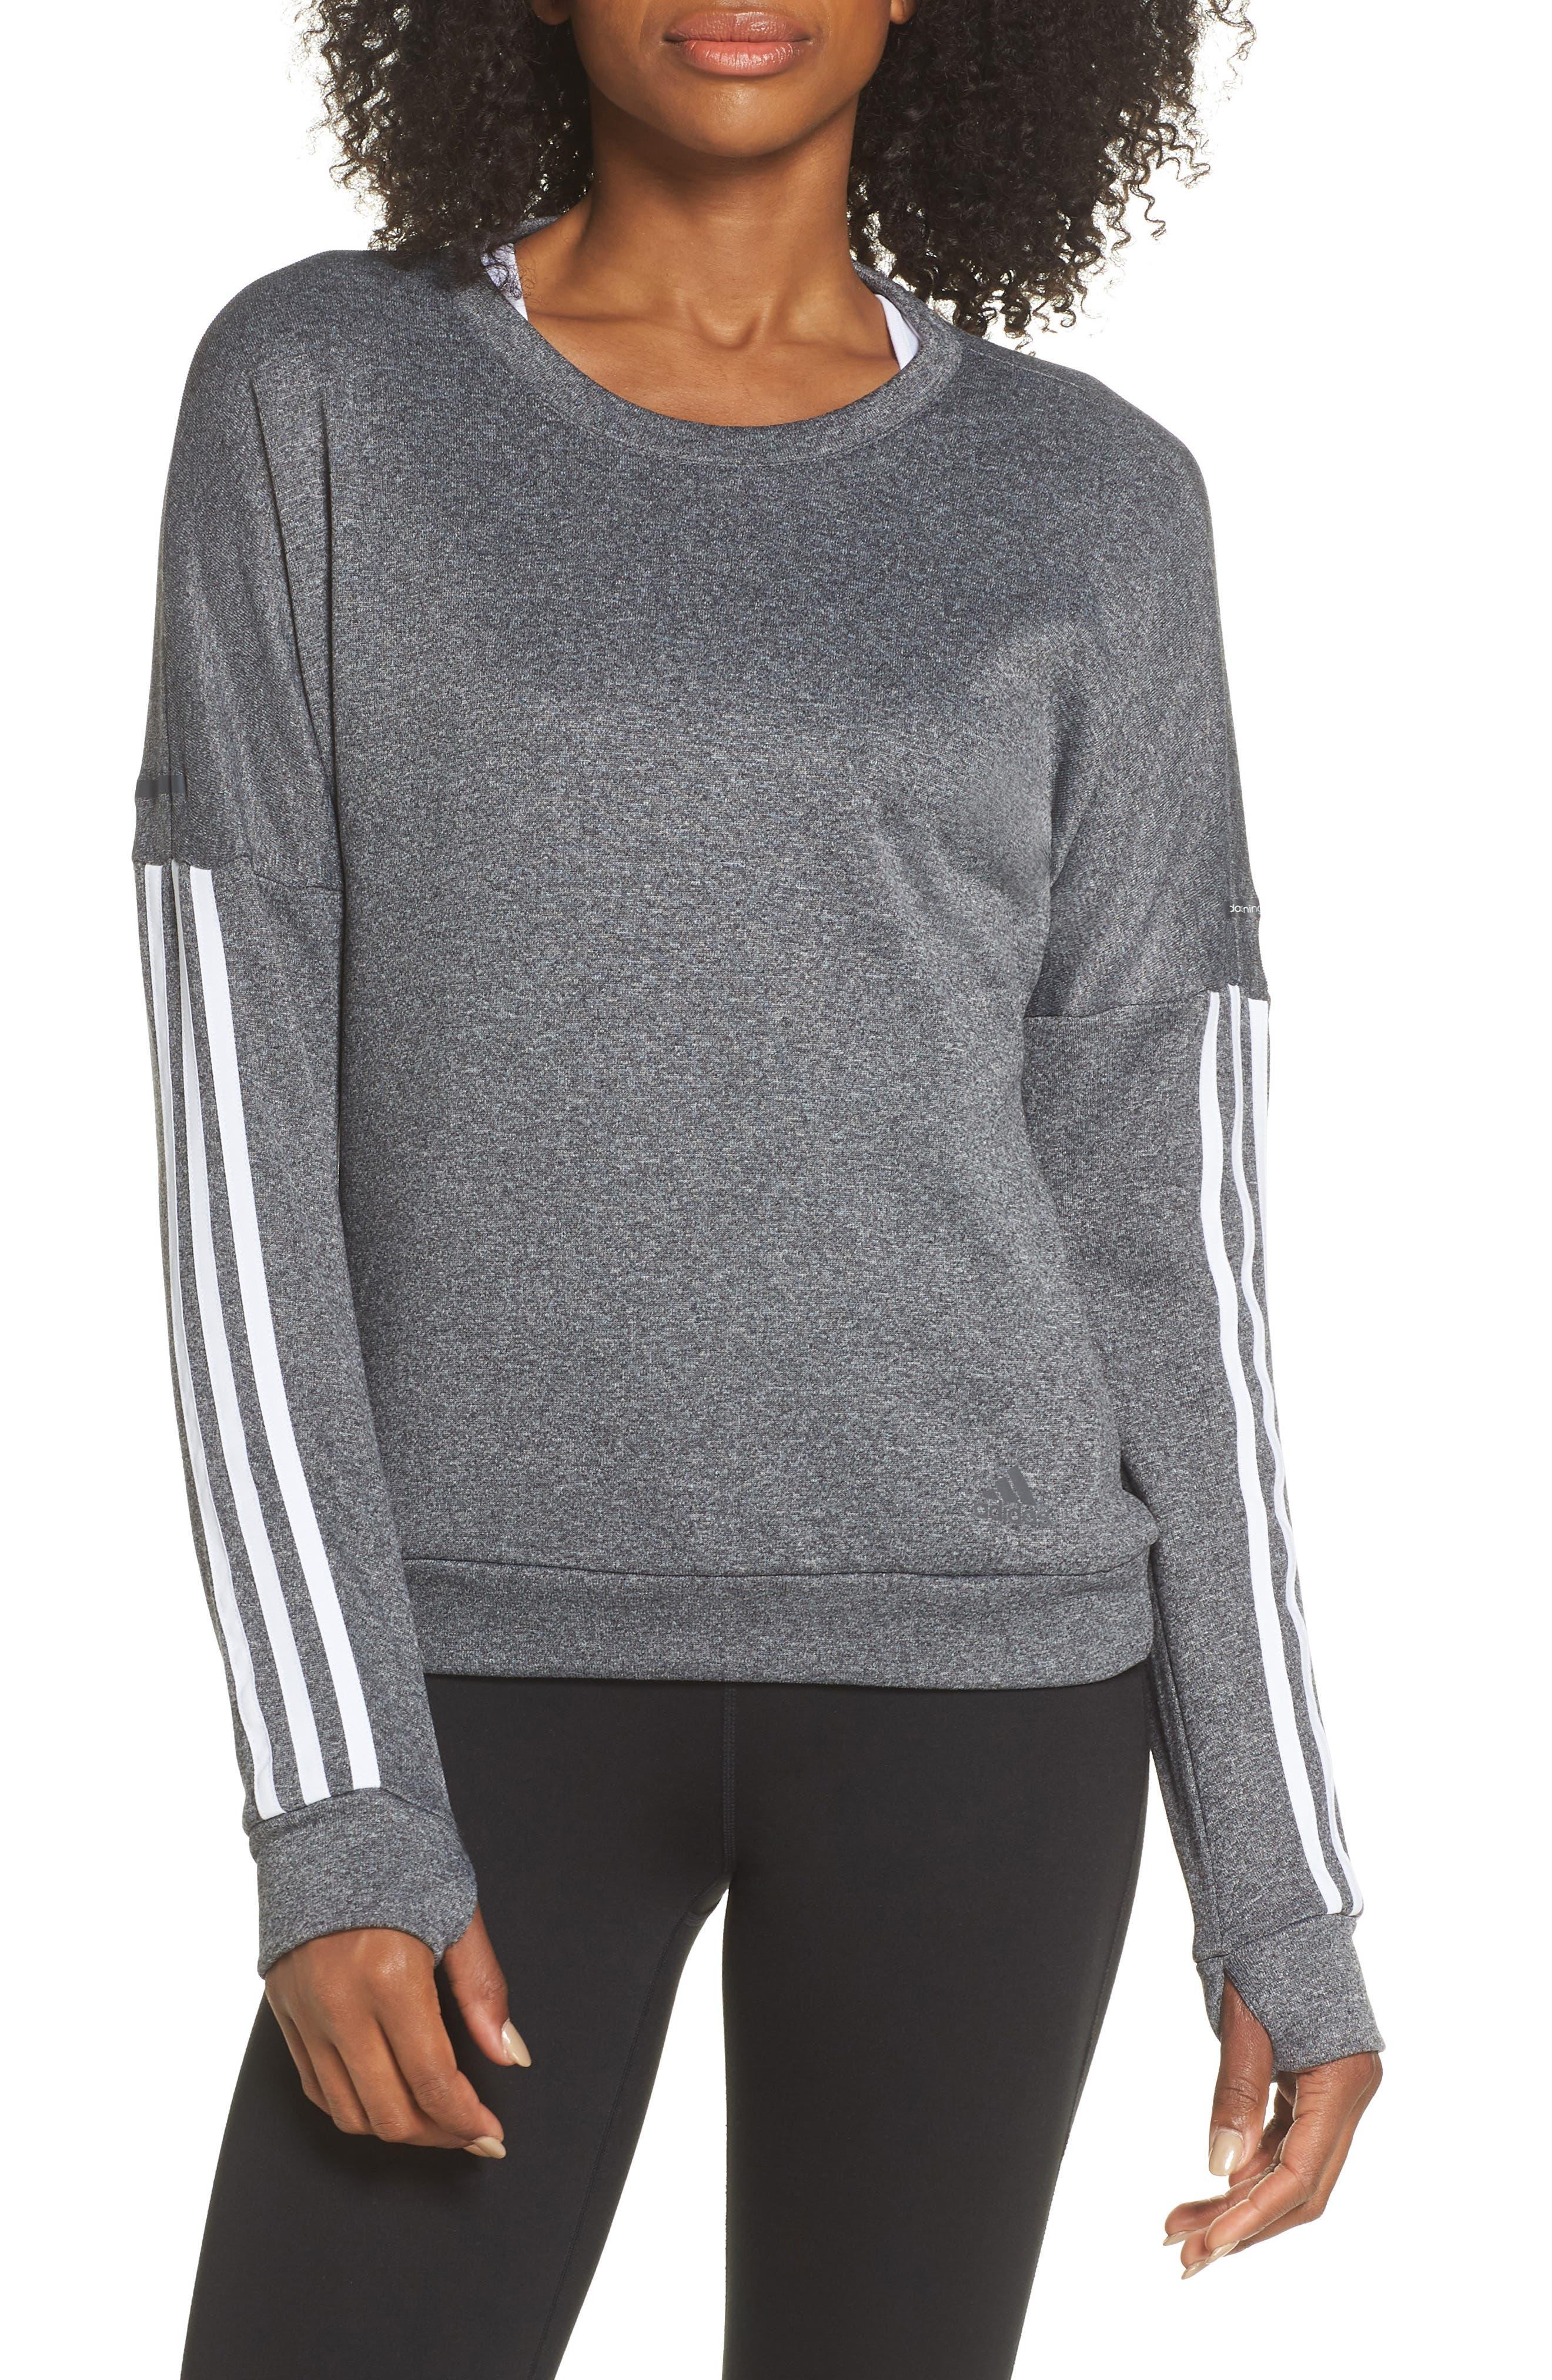 3-Stripes Running Sweatshirt,                             Main thumbnail 1, color,                             DARK GREY HEATHER